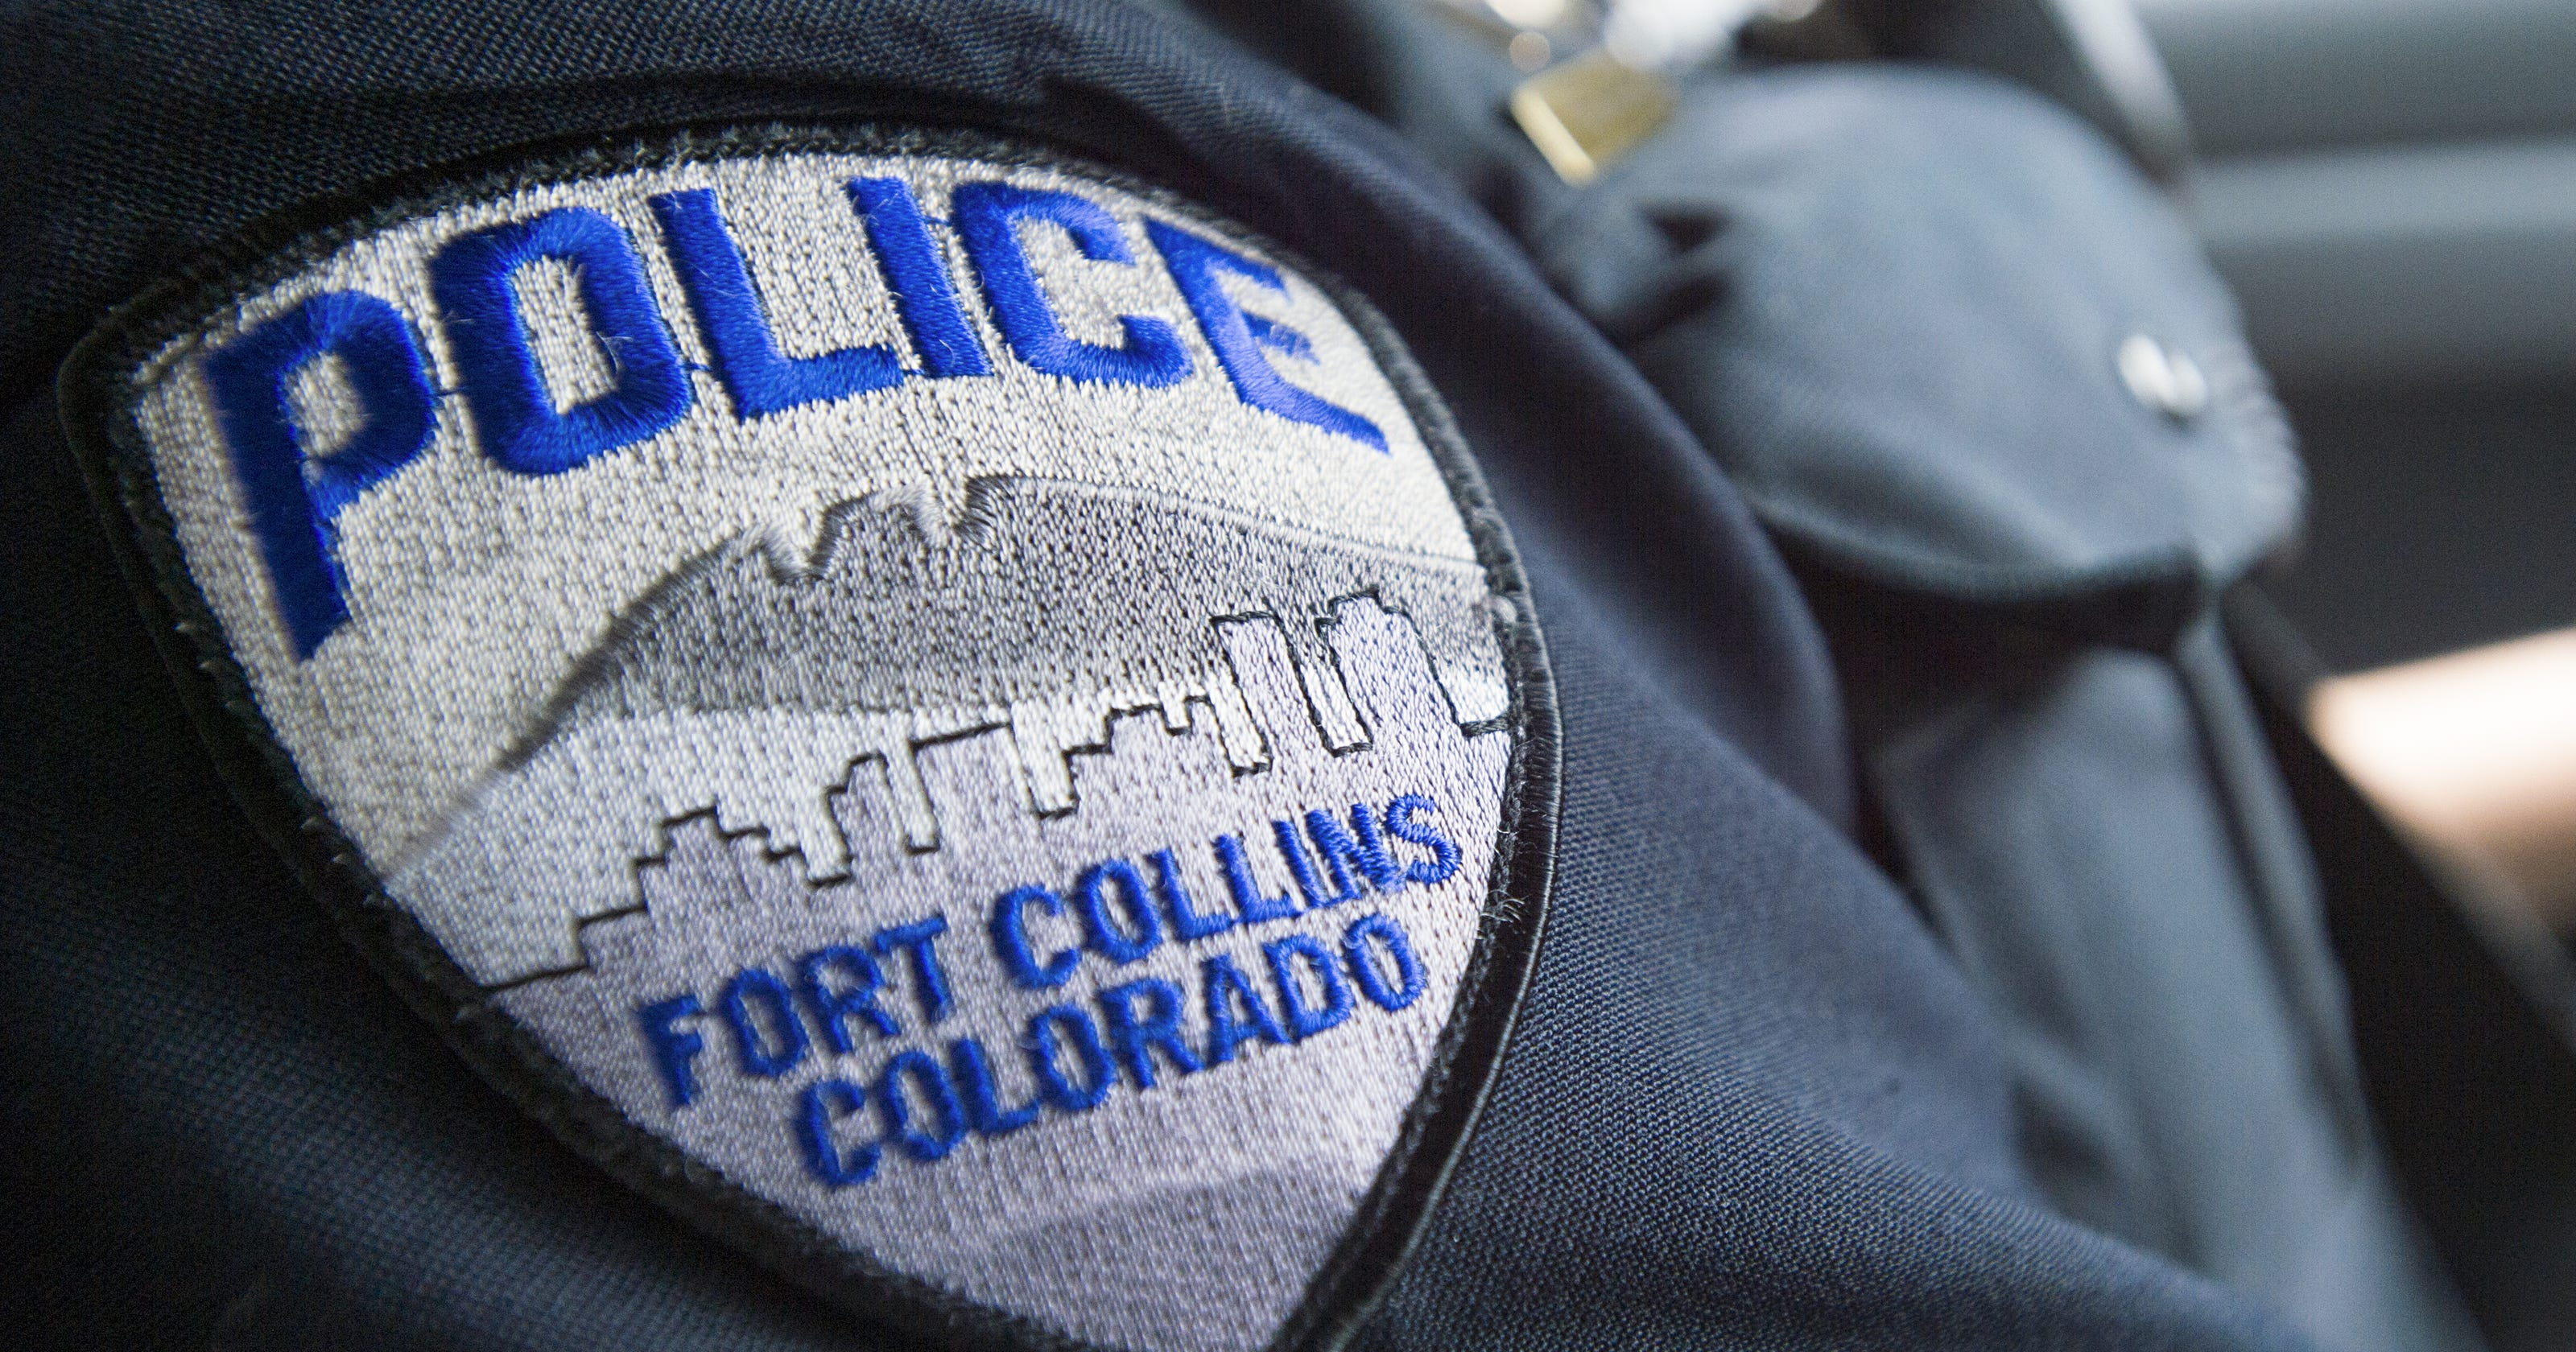 Fort Collins police: Stolen Big Bird figure ruffles feathers